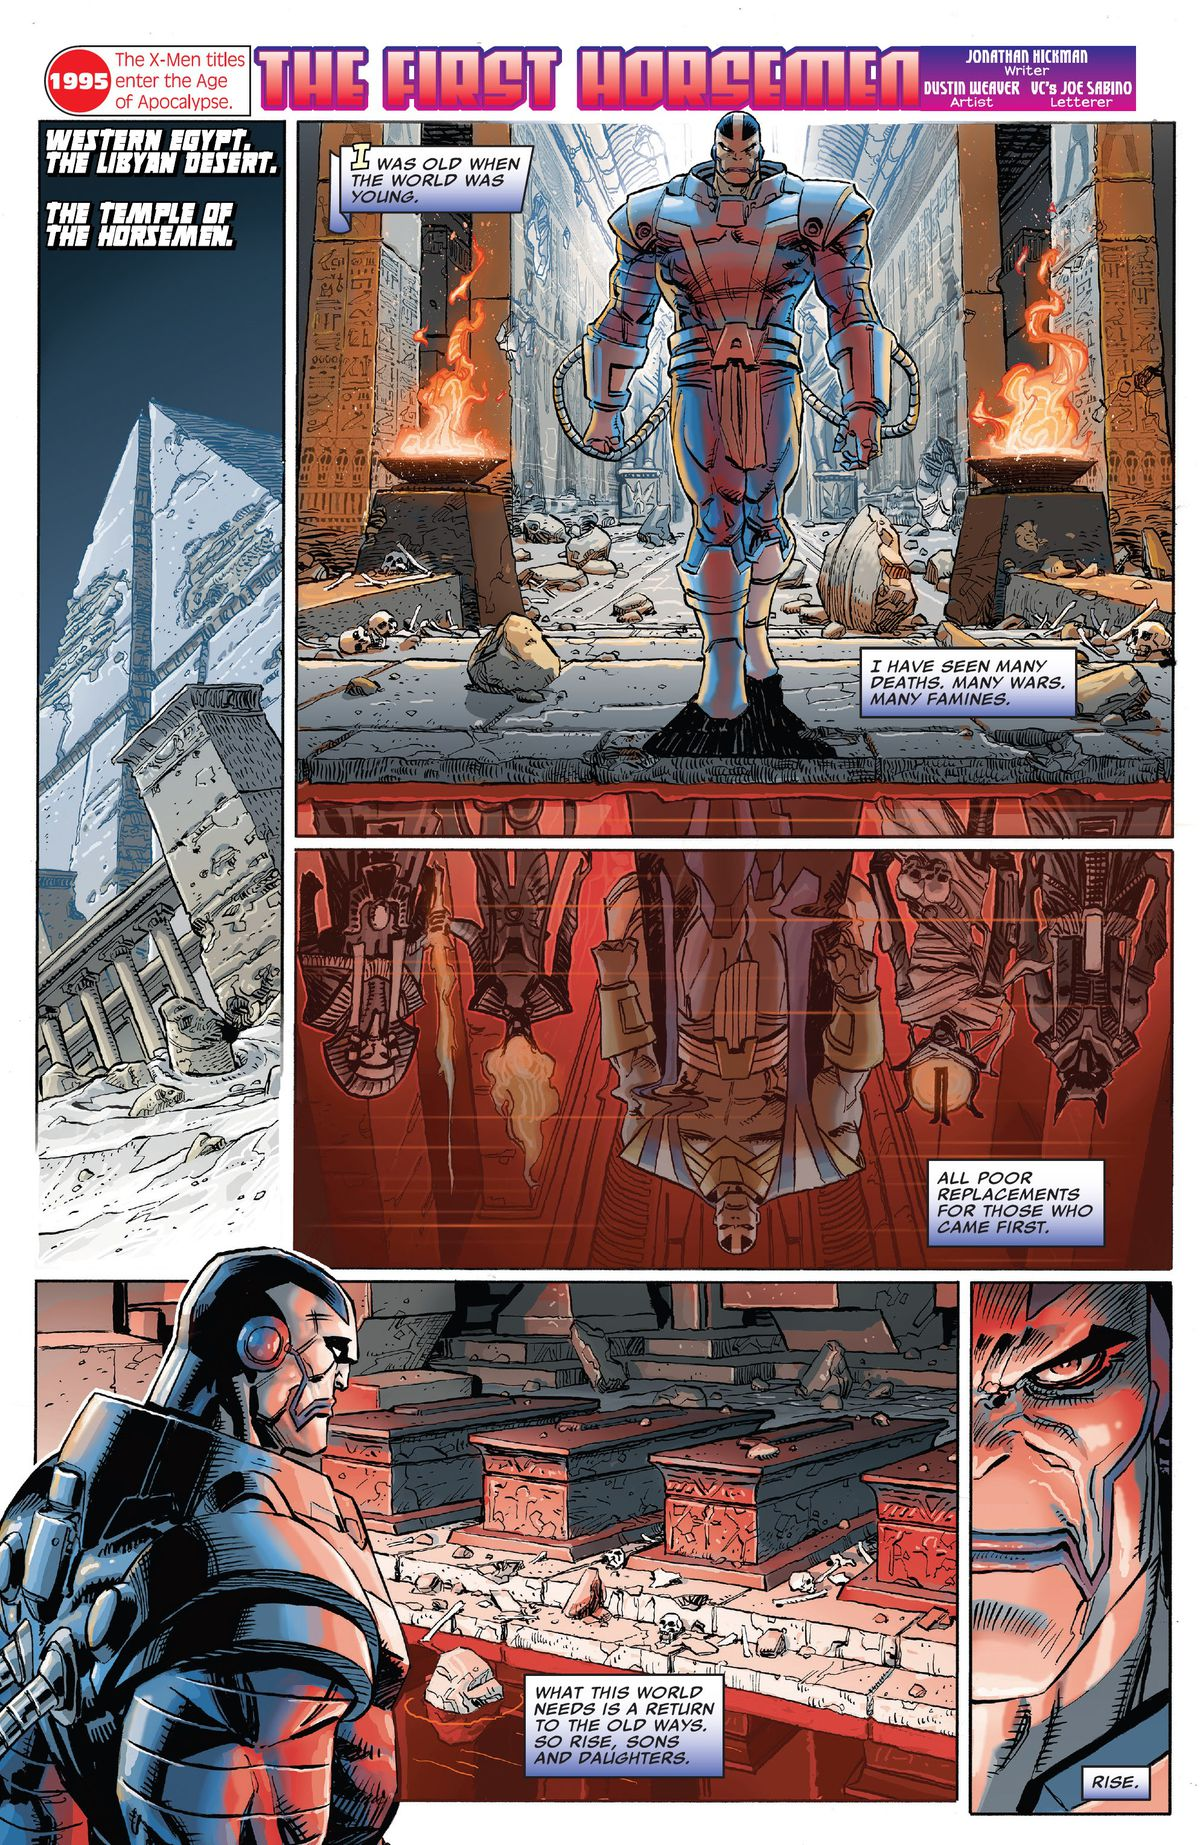 Apocalypse awakens his original four horsemen in a page from Marvel Comics #1000, Marvel Comics (2019).